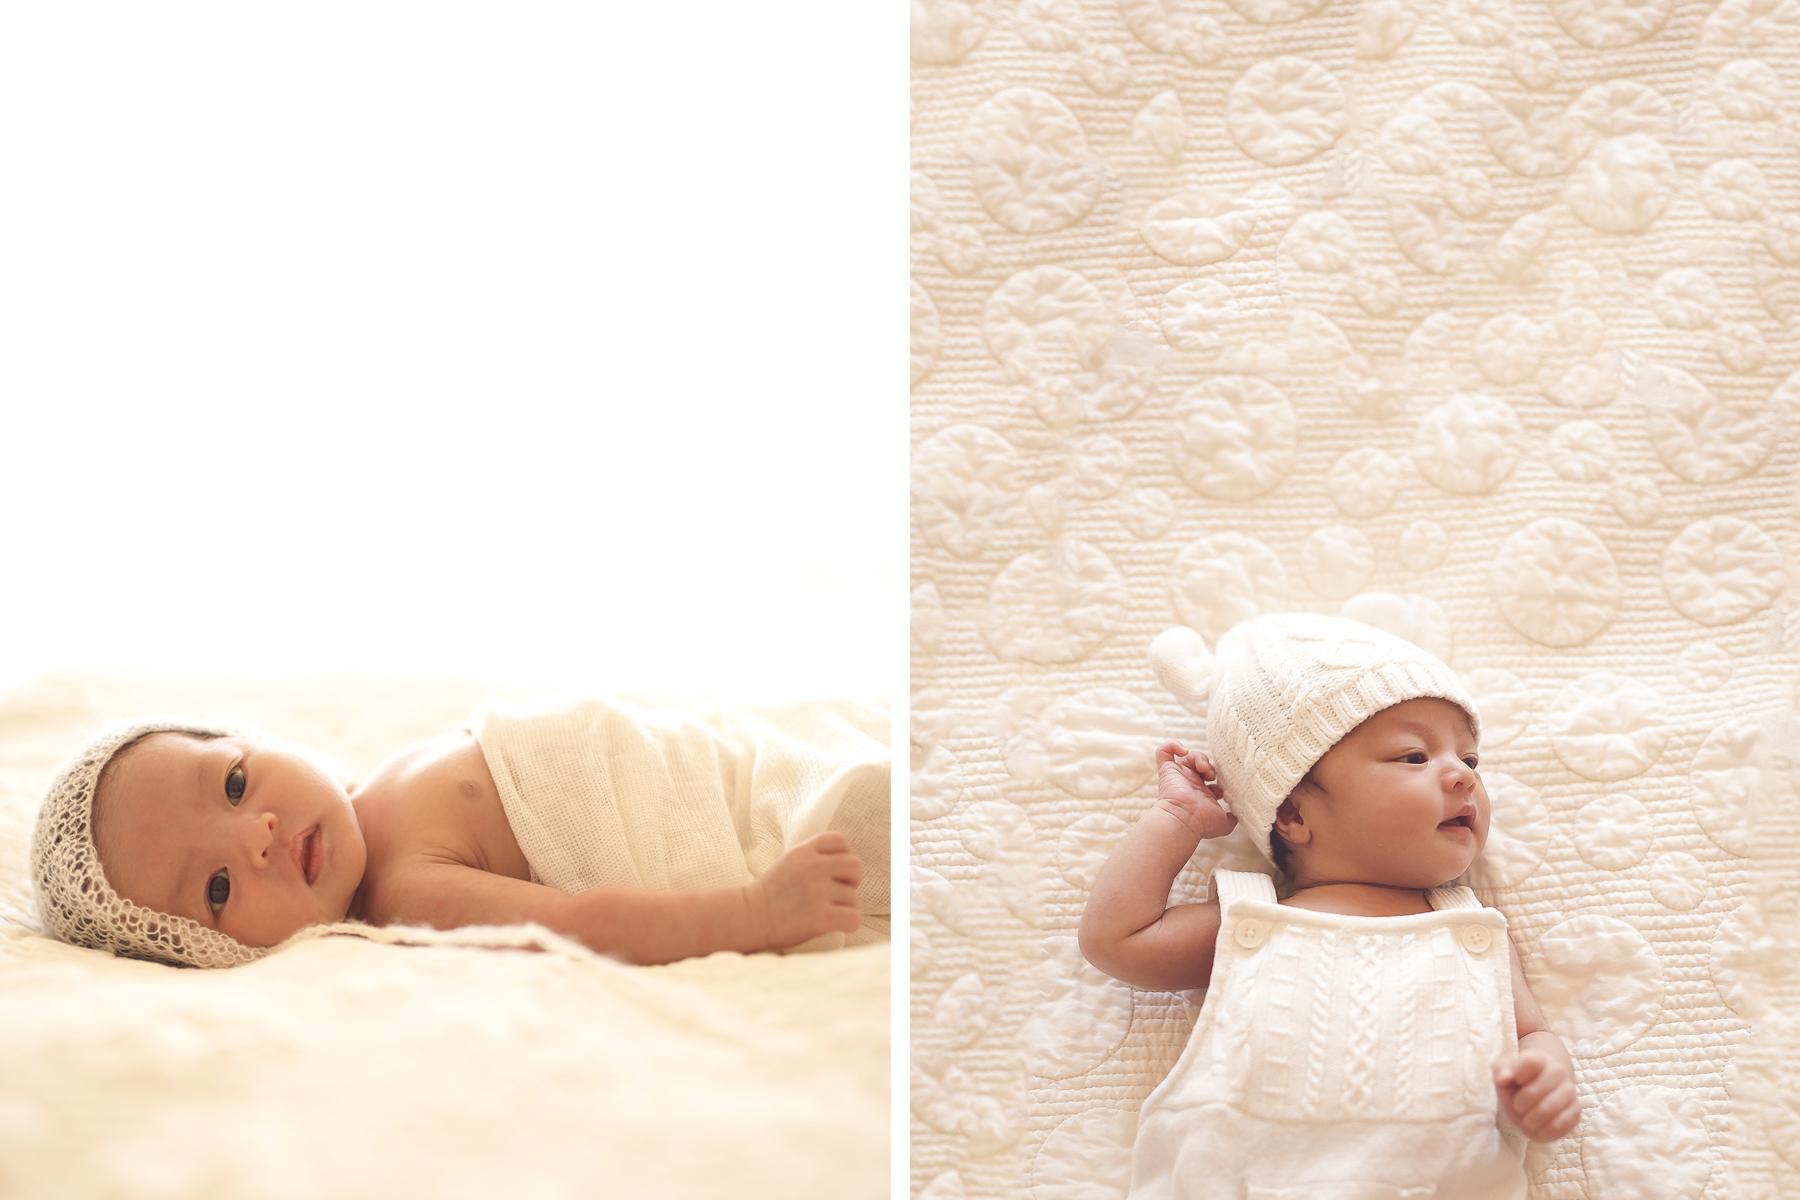 The Woodlands Newborn Photographerl in